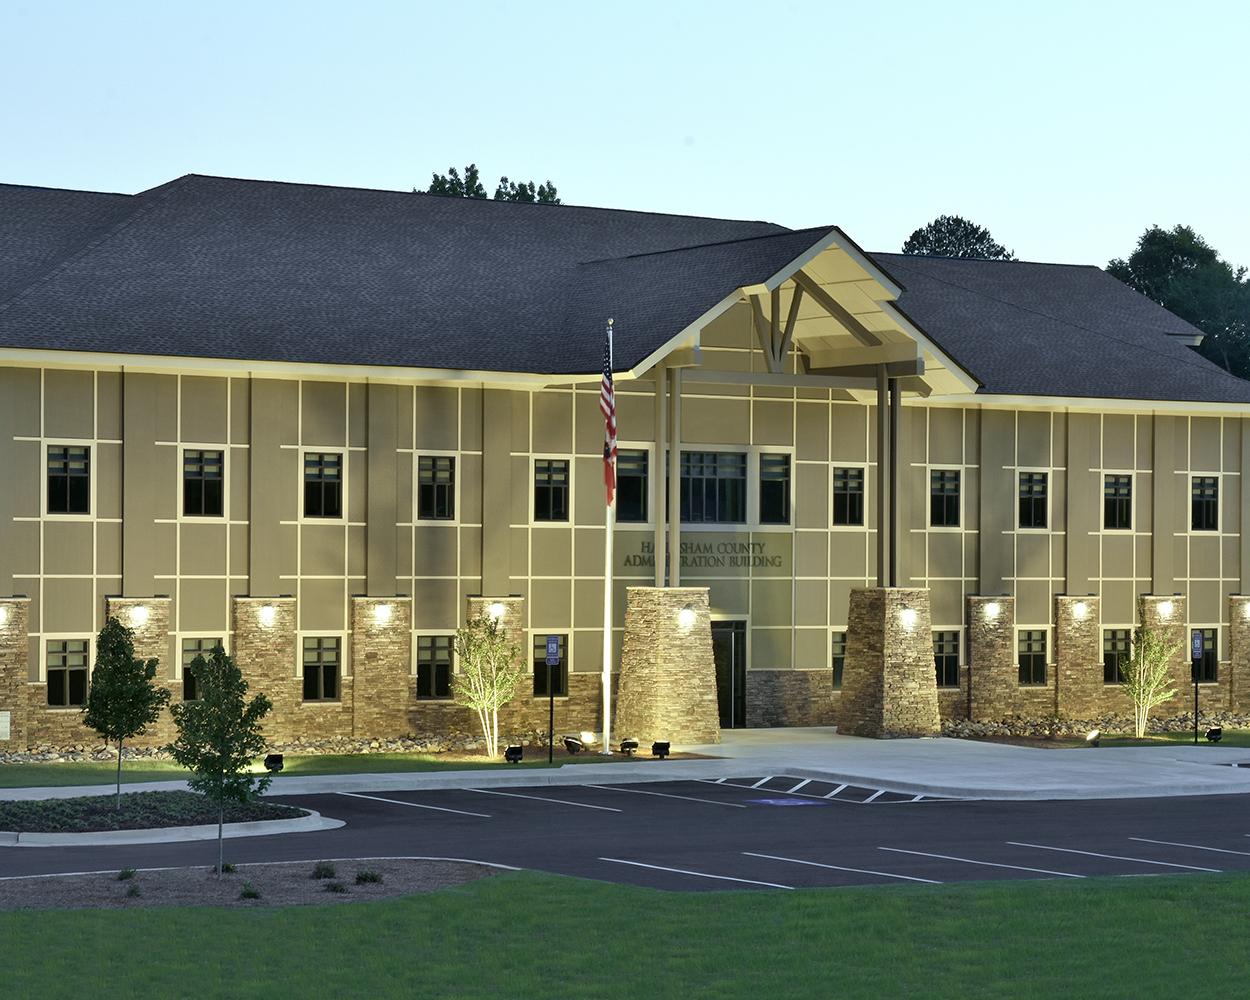 Habersham County Administration Building Clarkesville, GA | Cooper & Company General Contractors